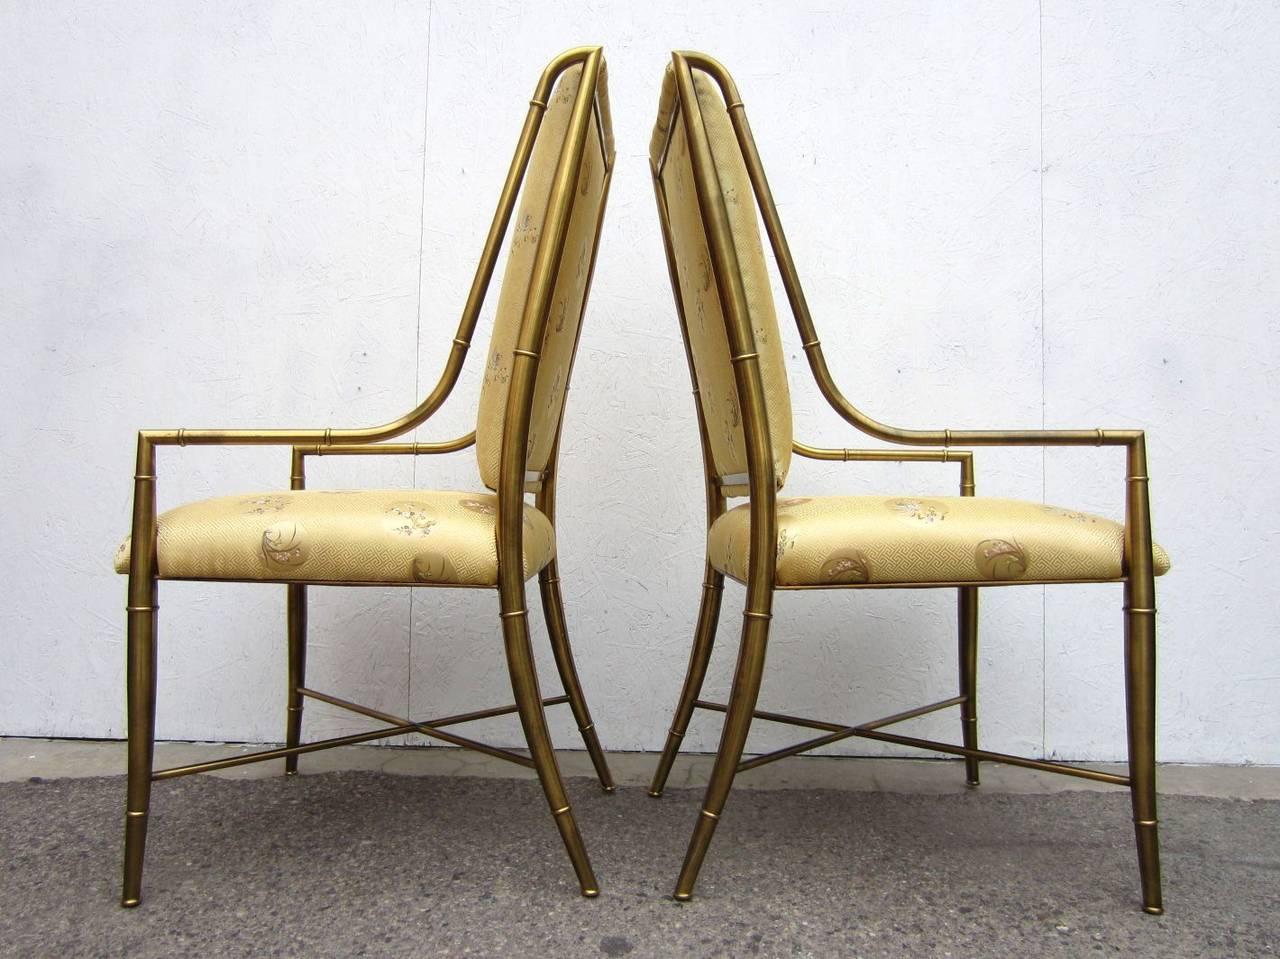 Mastercraft Furniture Brass Faux Bamboo Dining Chairs Set